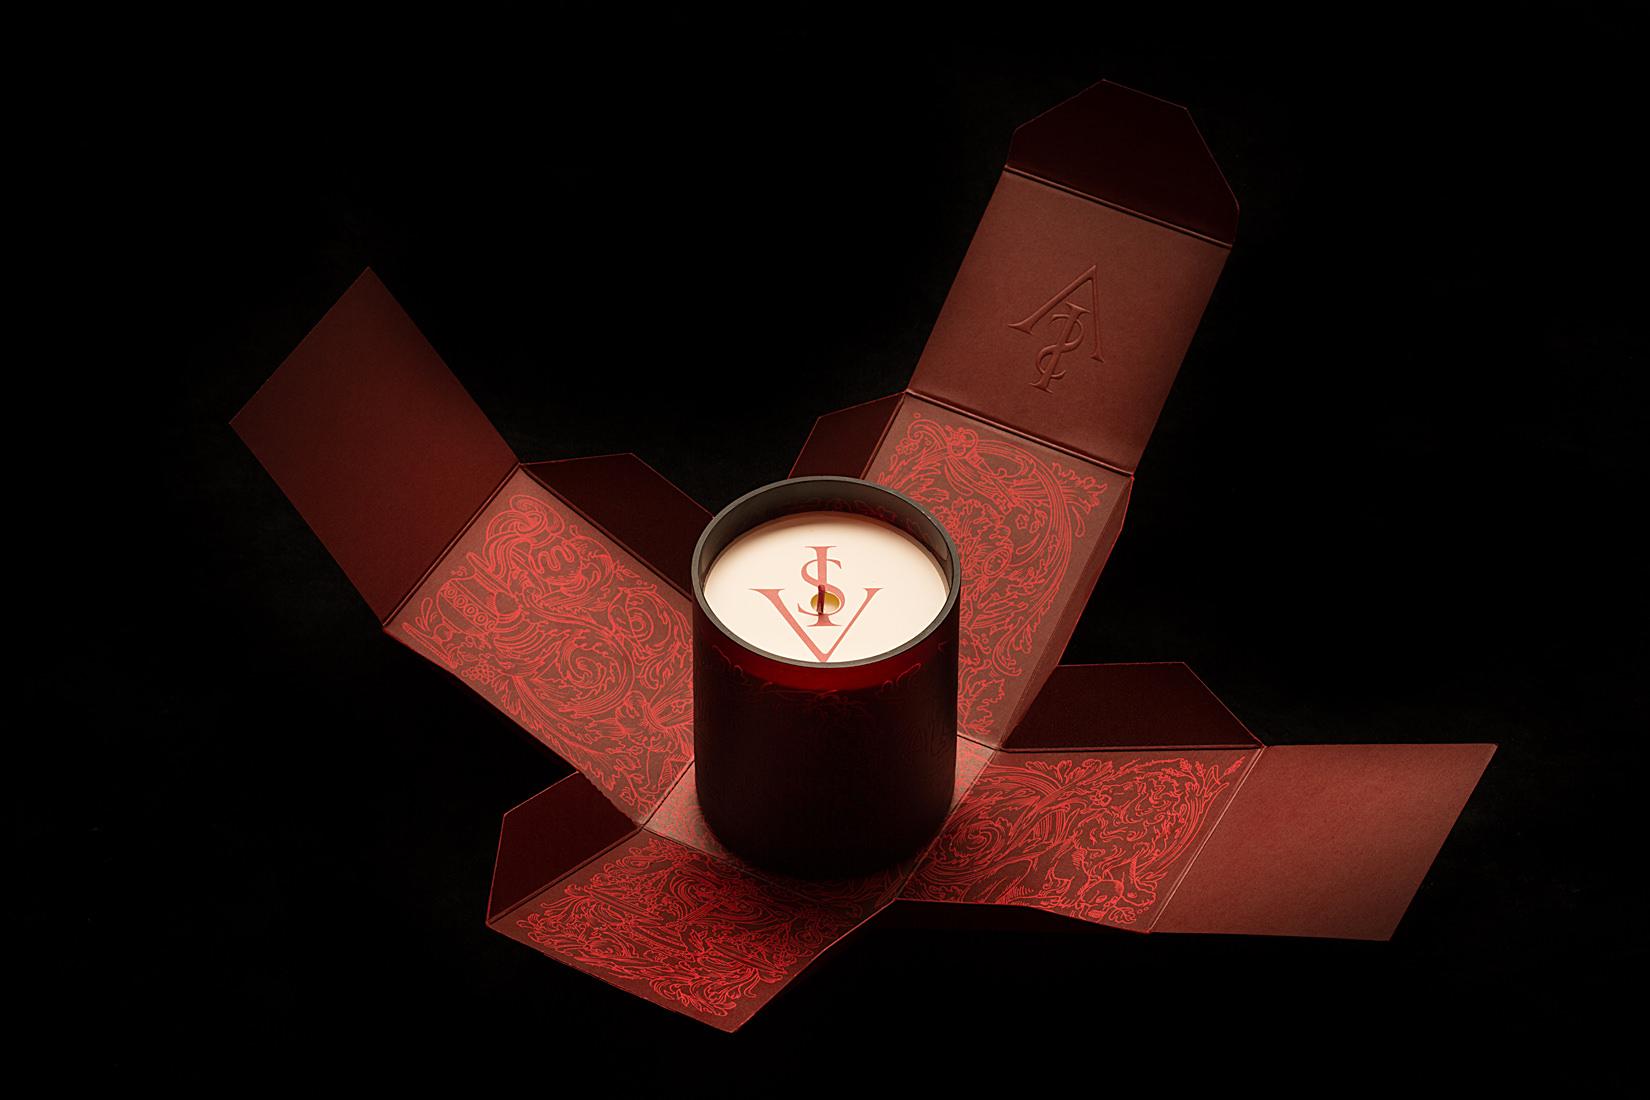 Temperantia Candles